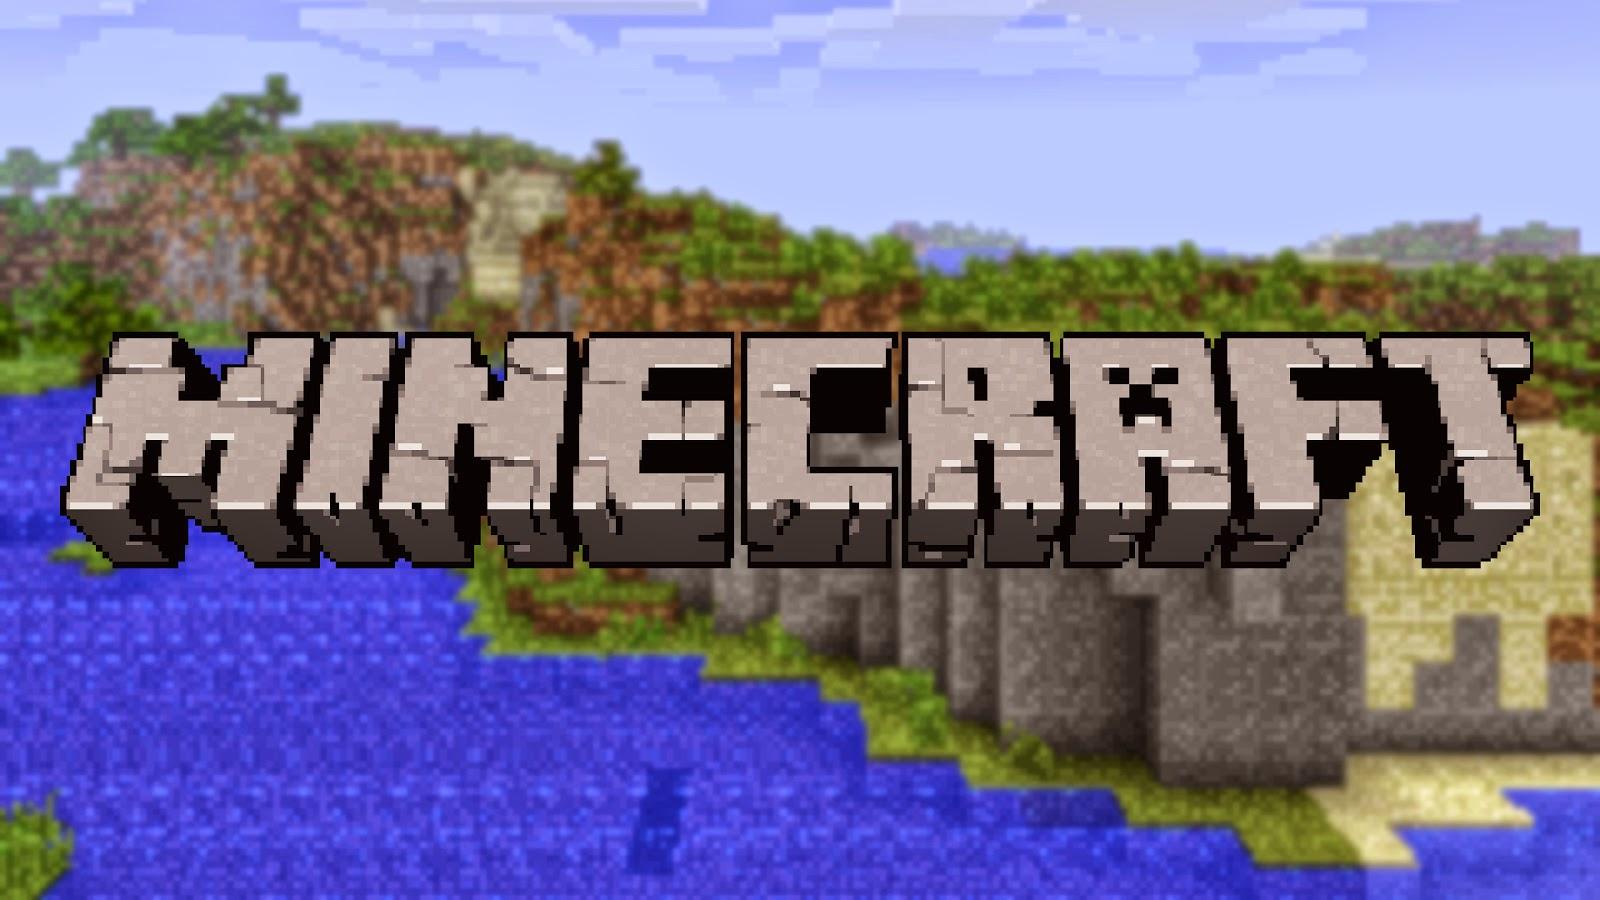 minecraft 1.7 2 download cracked team extreme